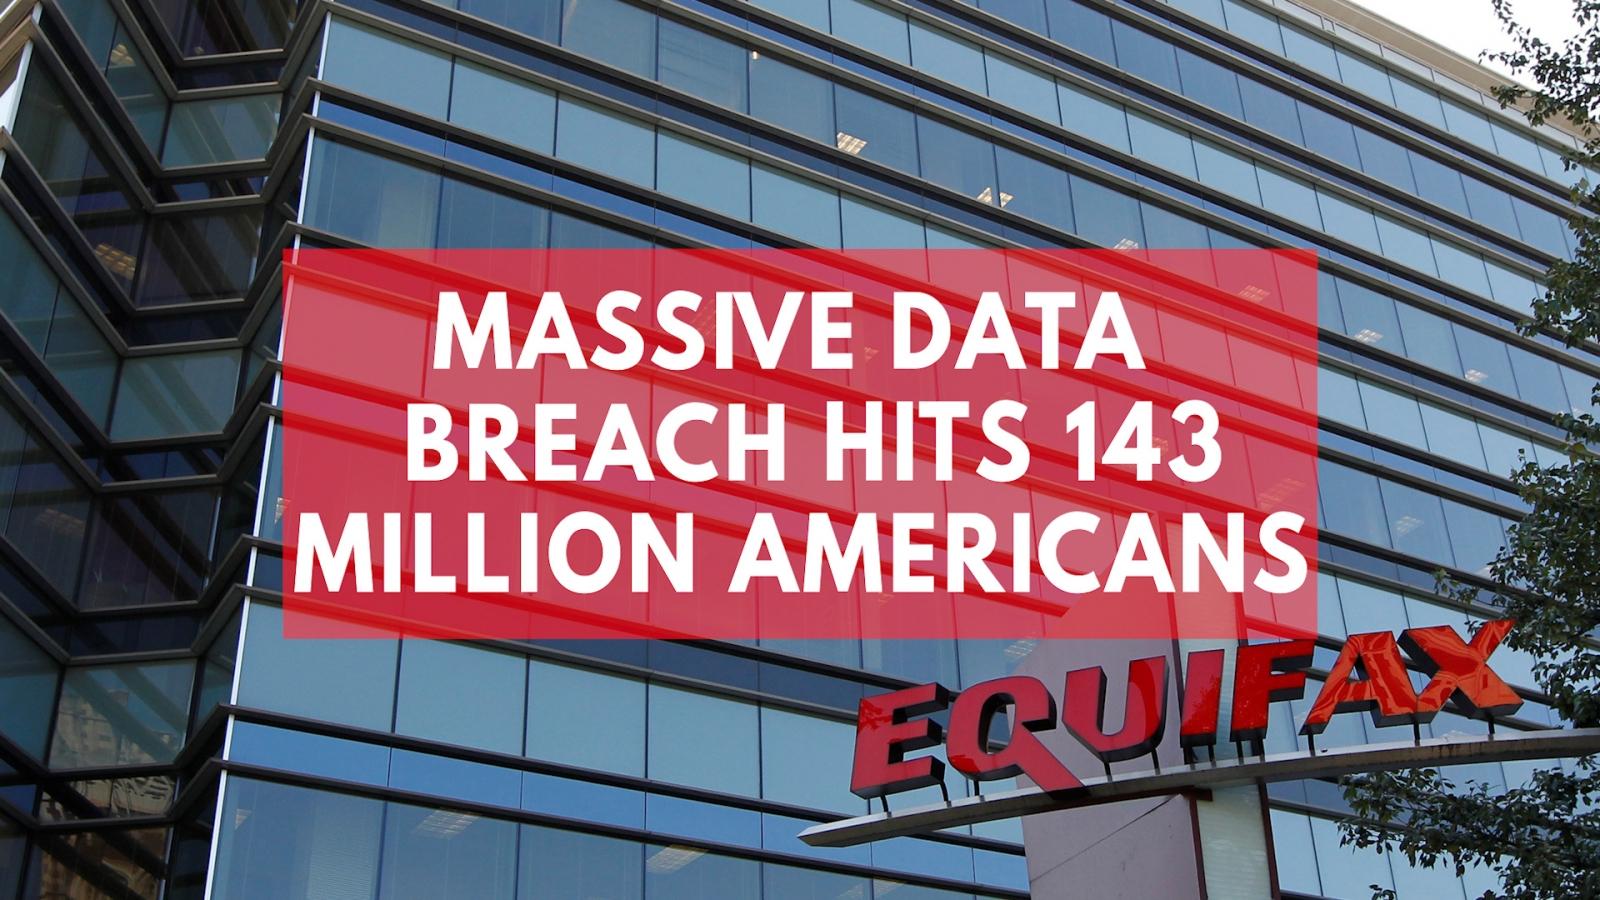 massive-equifax-data-breach-hits-143-million-americans